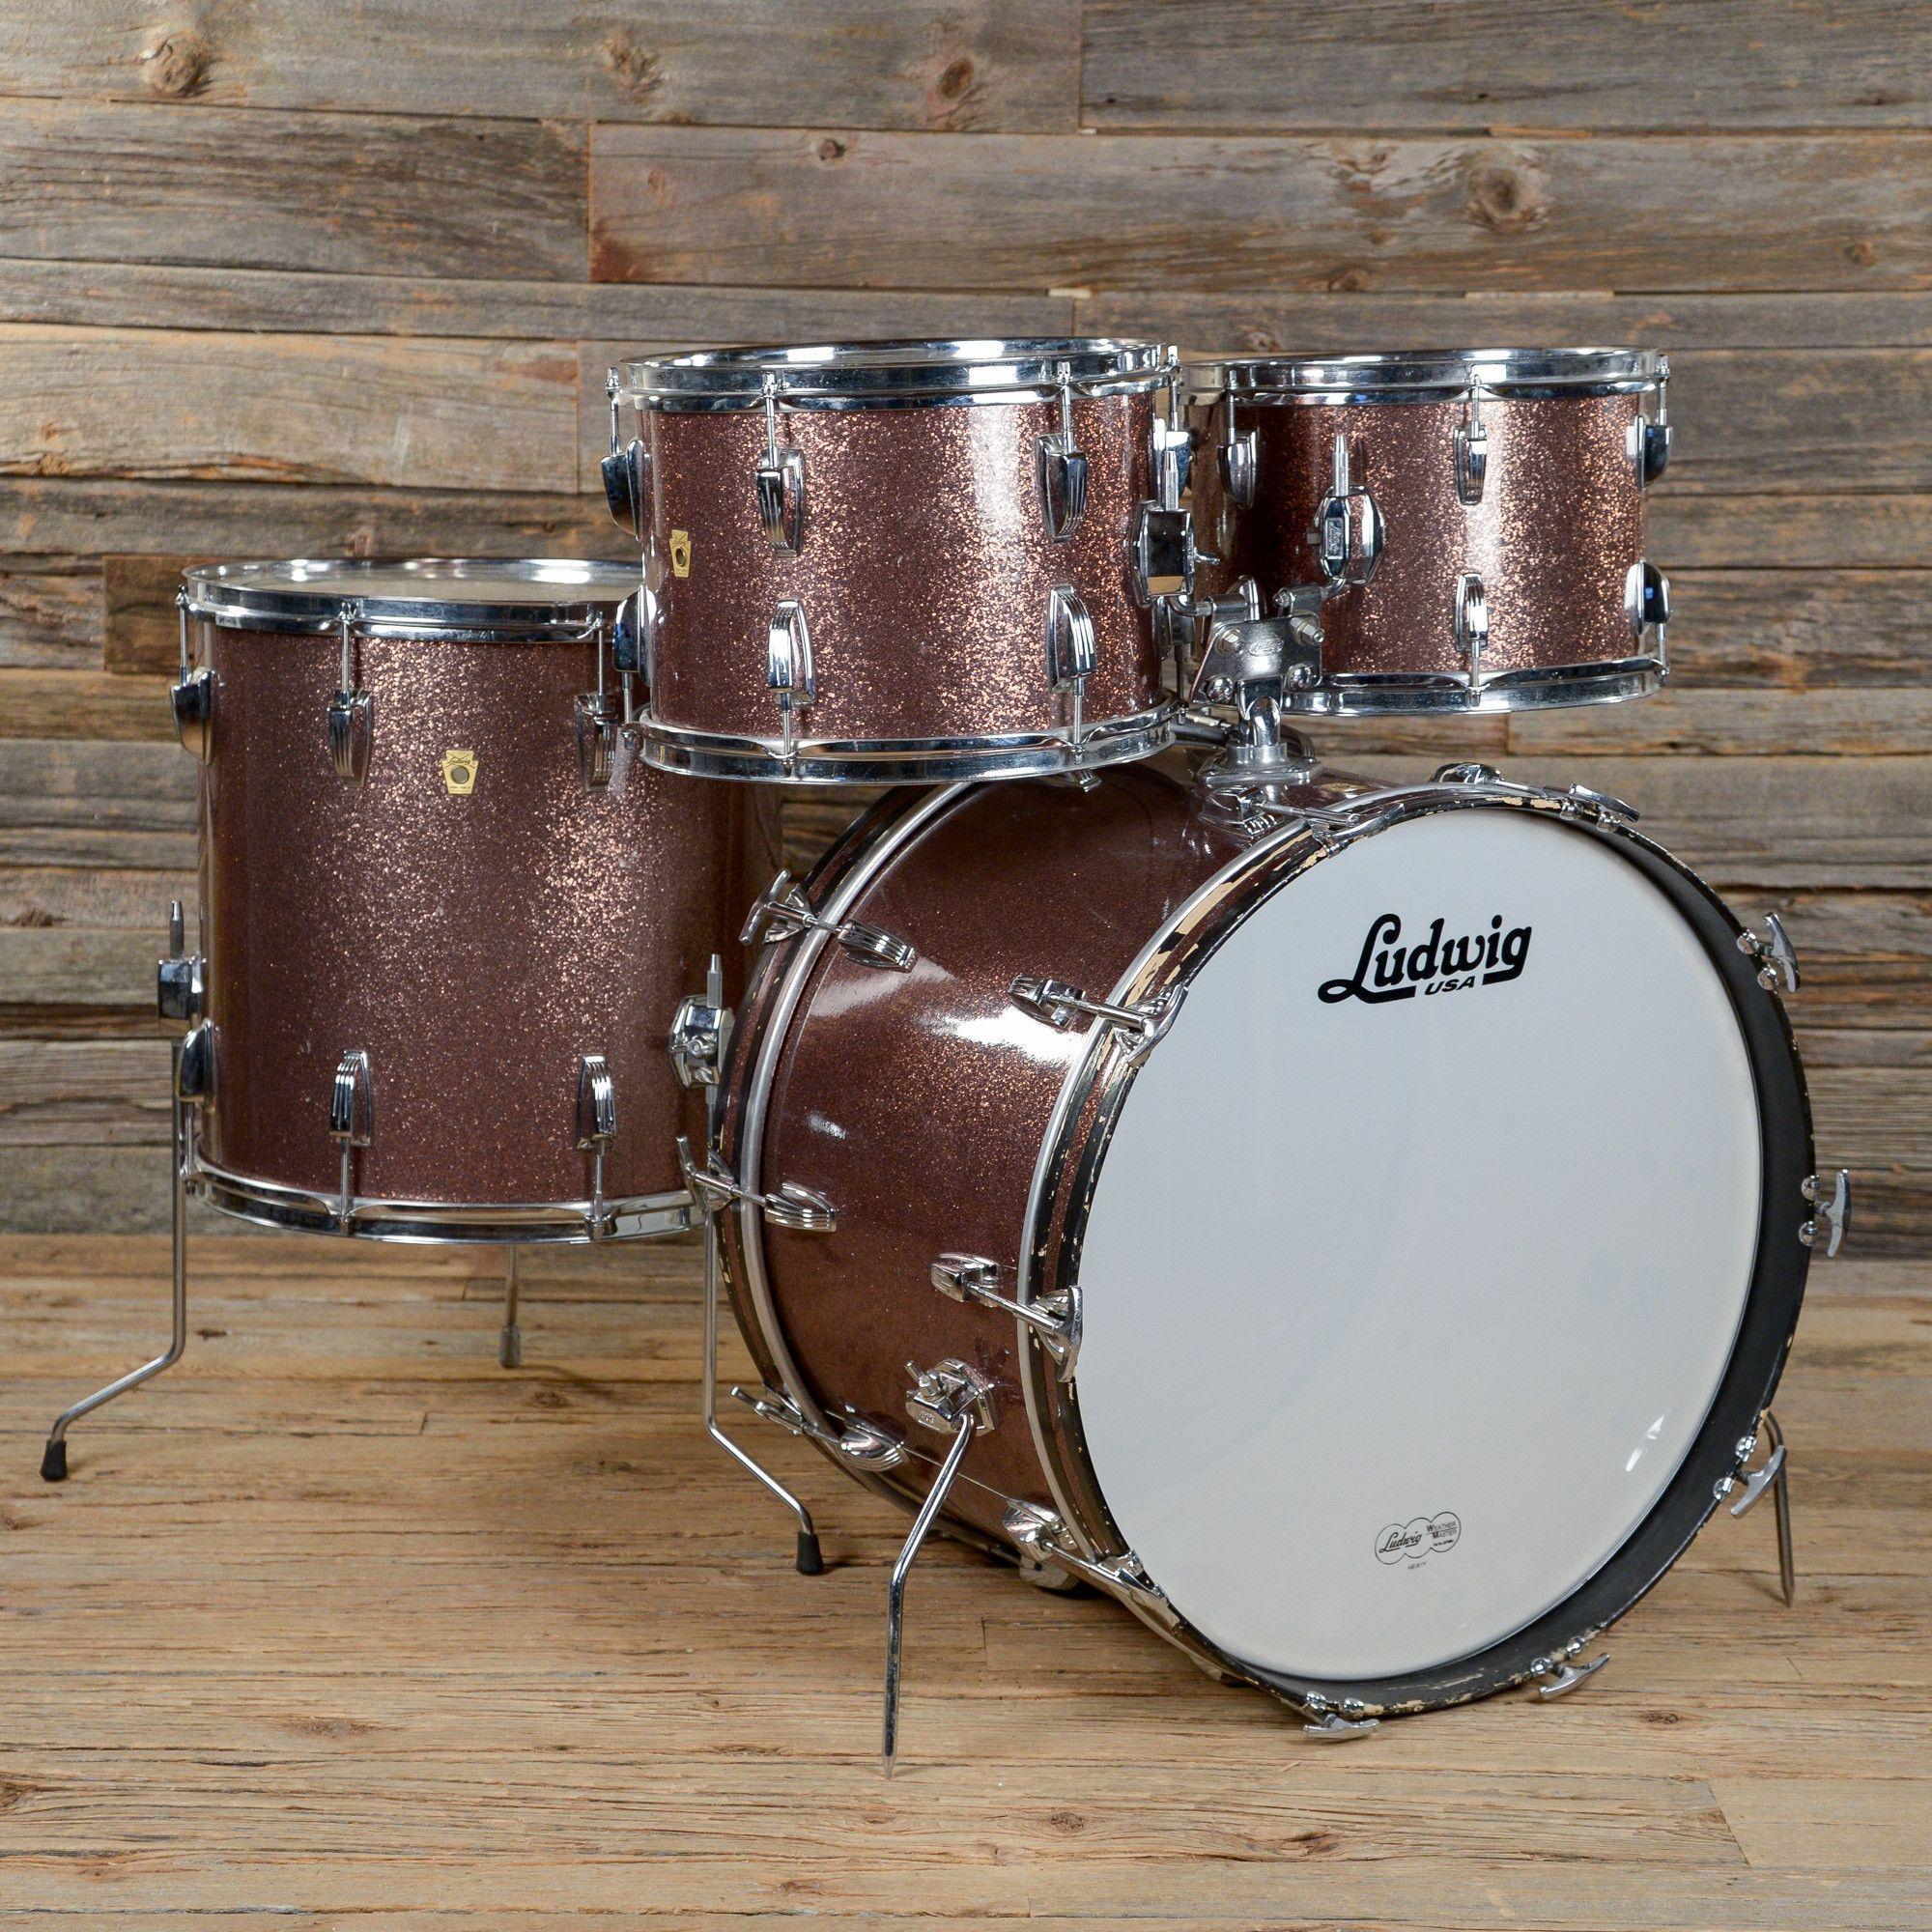 ludwig 12 13 16 22 4pc hollywood drum kit burgundy sparkle 1967 used drums pinterest drum. Black Bedroom Furniture Sets. Home Design Ideas